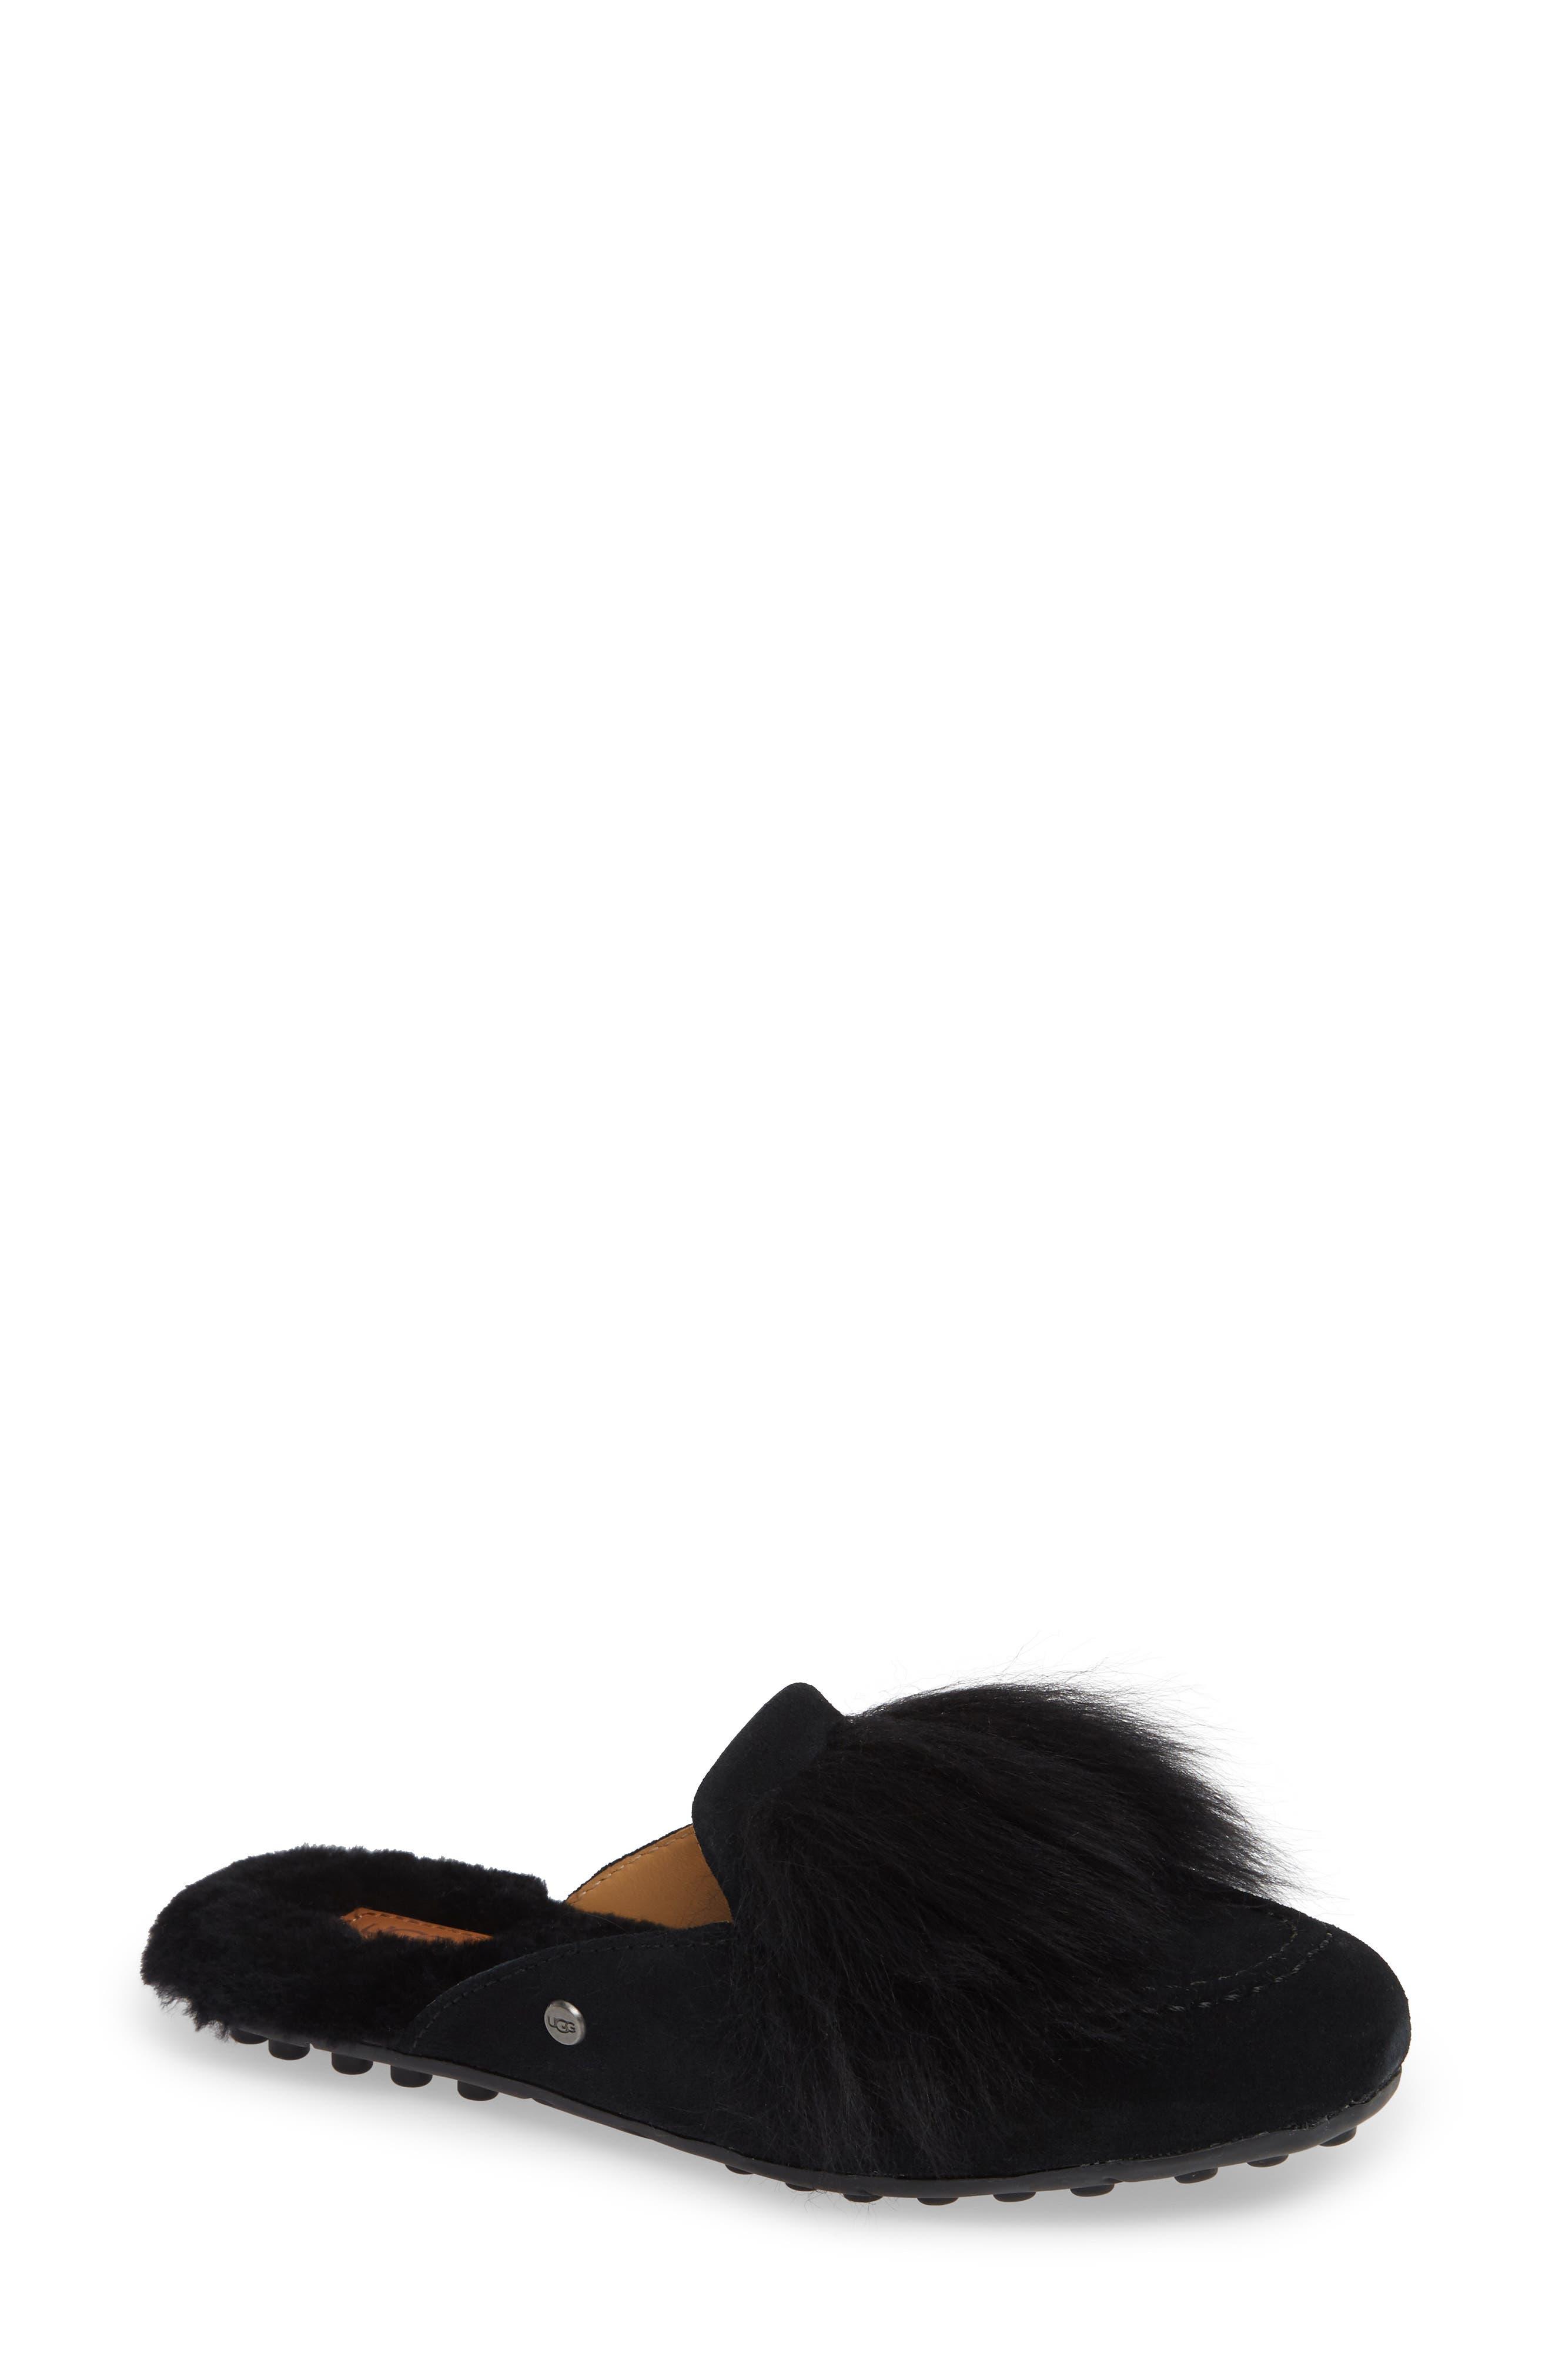 UGG<SUP>®</SUP>, Shaine Wisp Genuine Shearling Slipper, Main thumbnail 1, color, BLACK